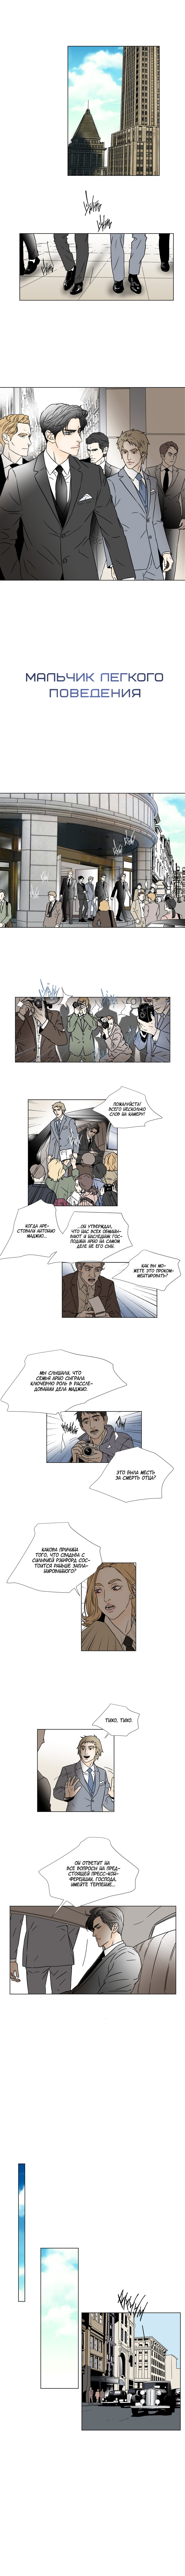 https://r2.ninemanga.com/comics/pic5/54/34166/1403906/1561550995909.jpg Page 1